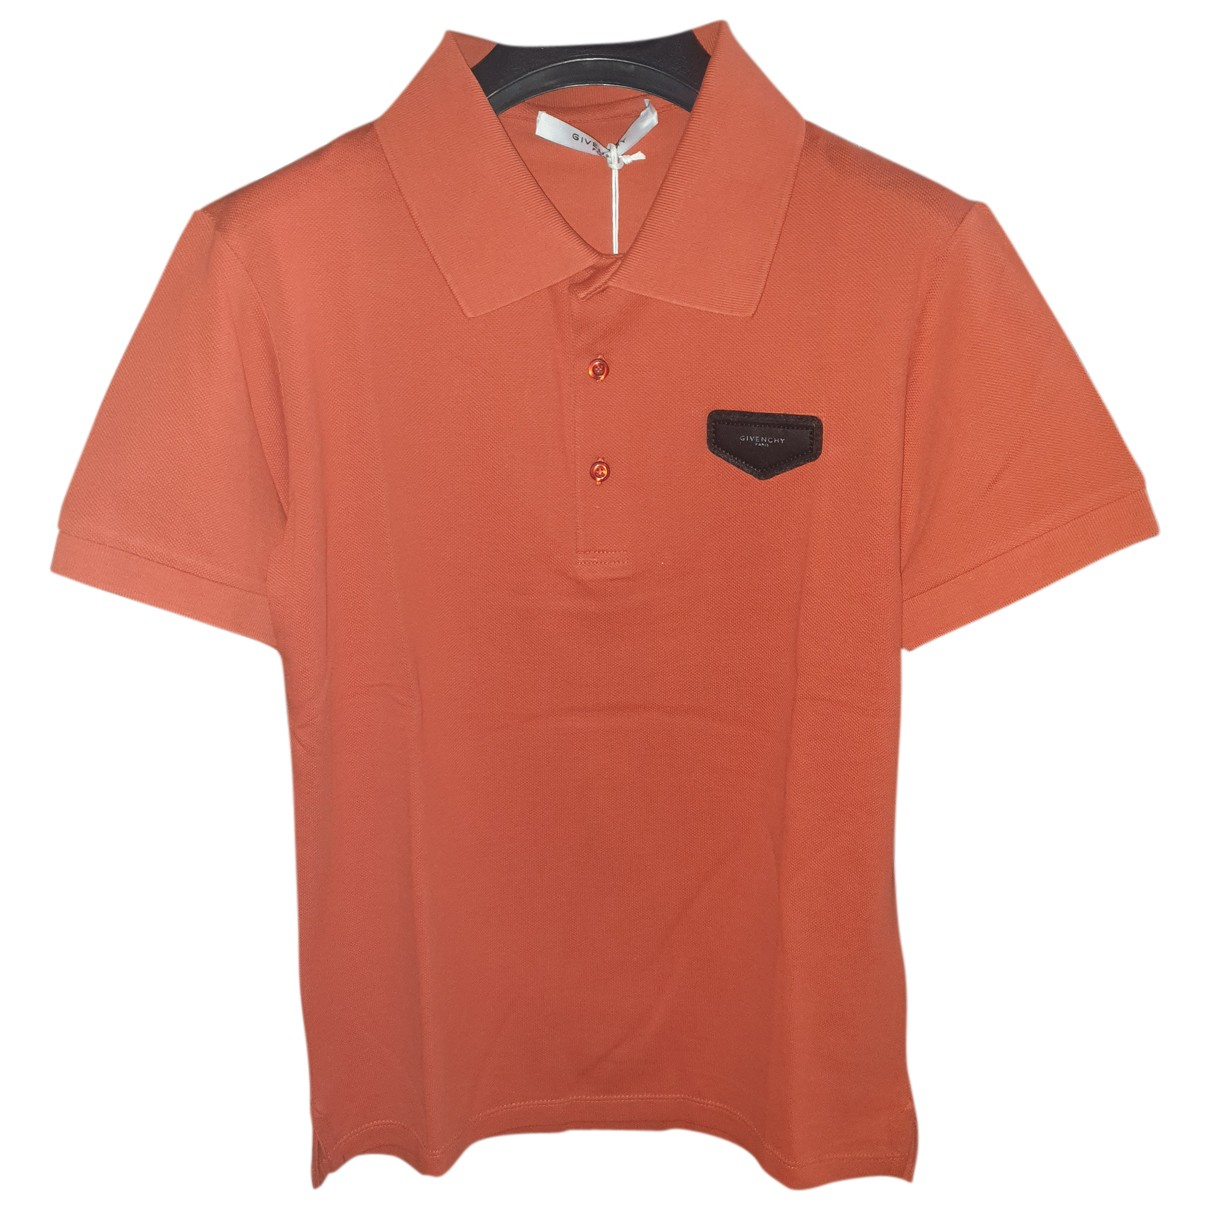 Givenchy - Polos   pour homme en coton - orange